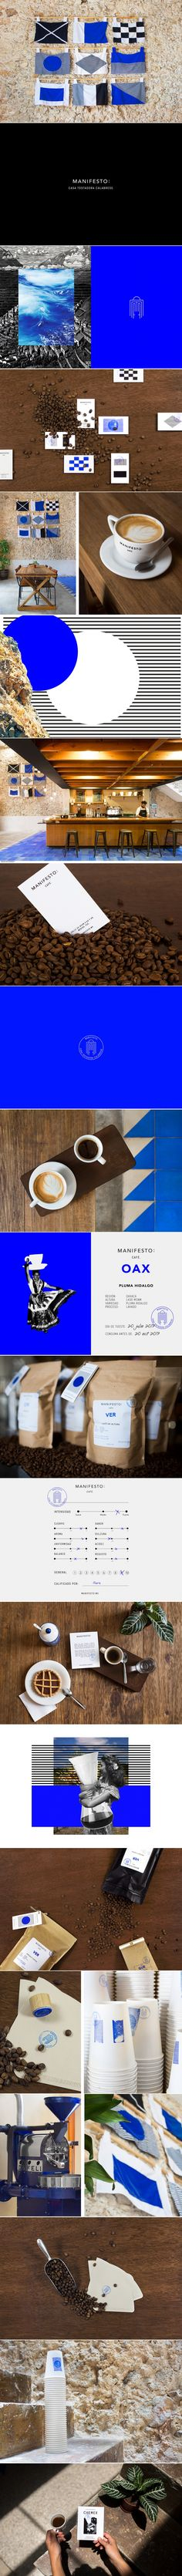 Manifesto coffee house brand identity by Bienal Comunicacion Coffee Shop Branding, Cafe Branding, Branding Ideas, Branding Agency, Brand Packaging, Packaging Design, Branding Design, Logo Design, Graphic Design